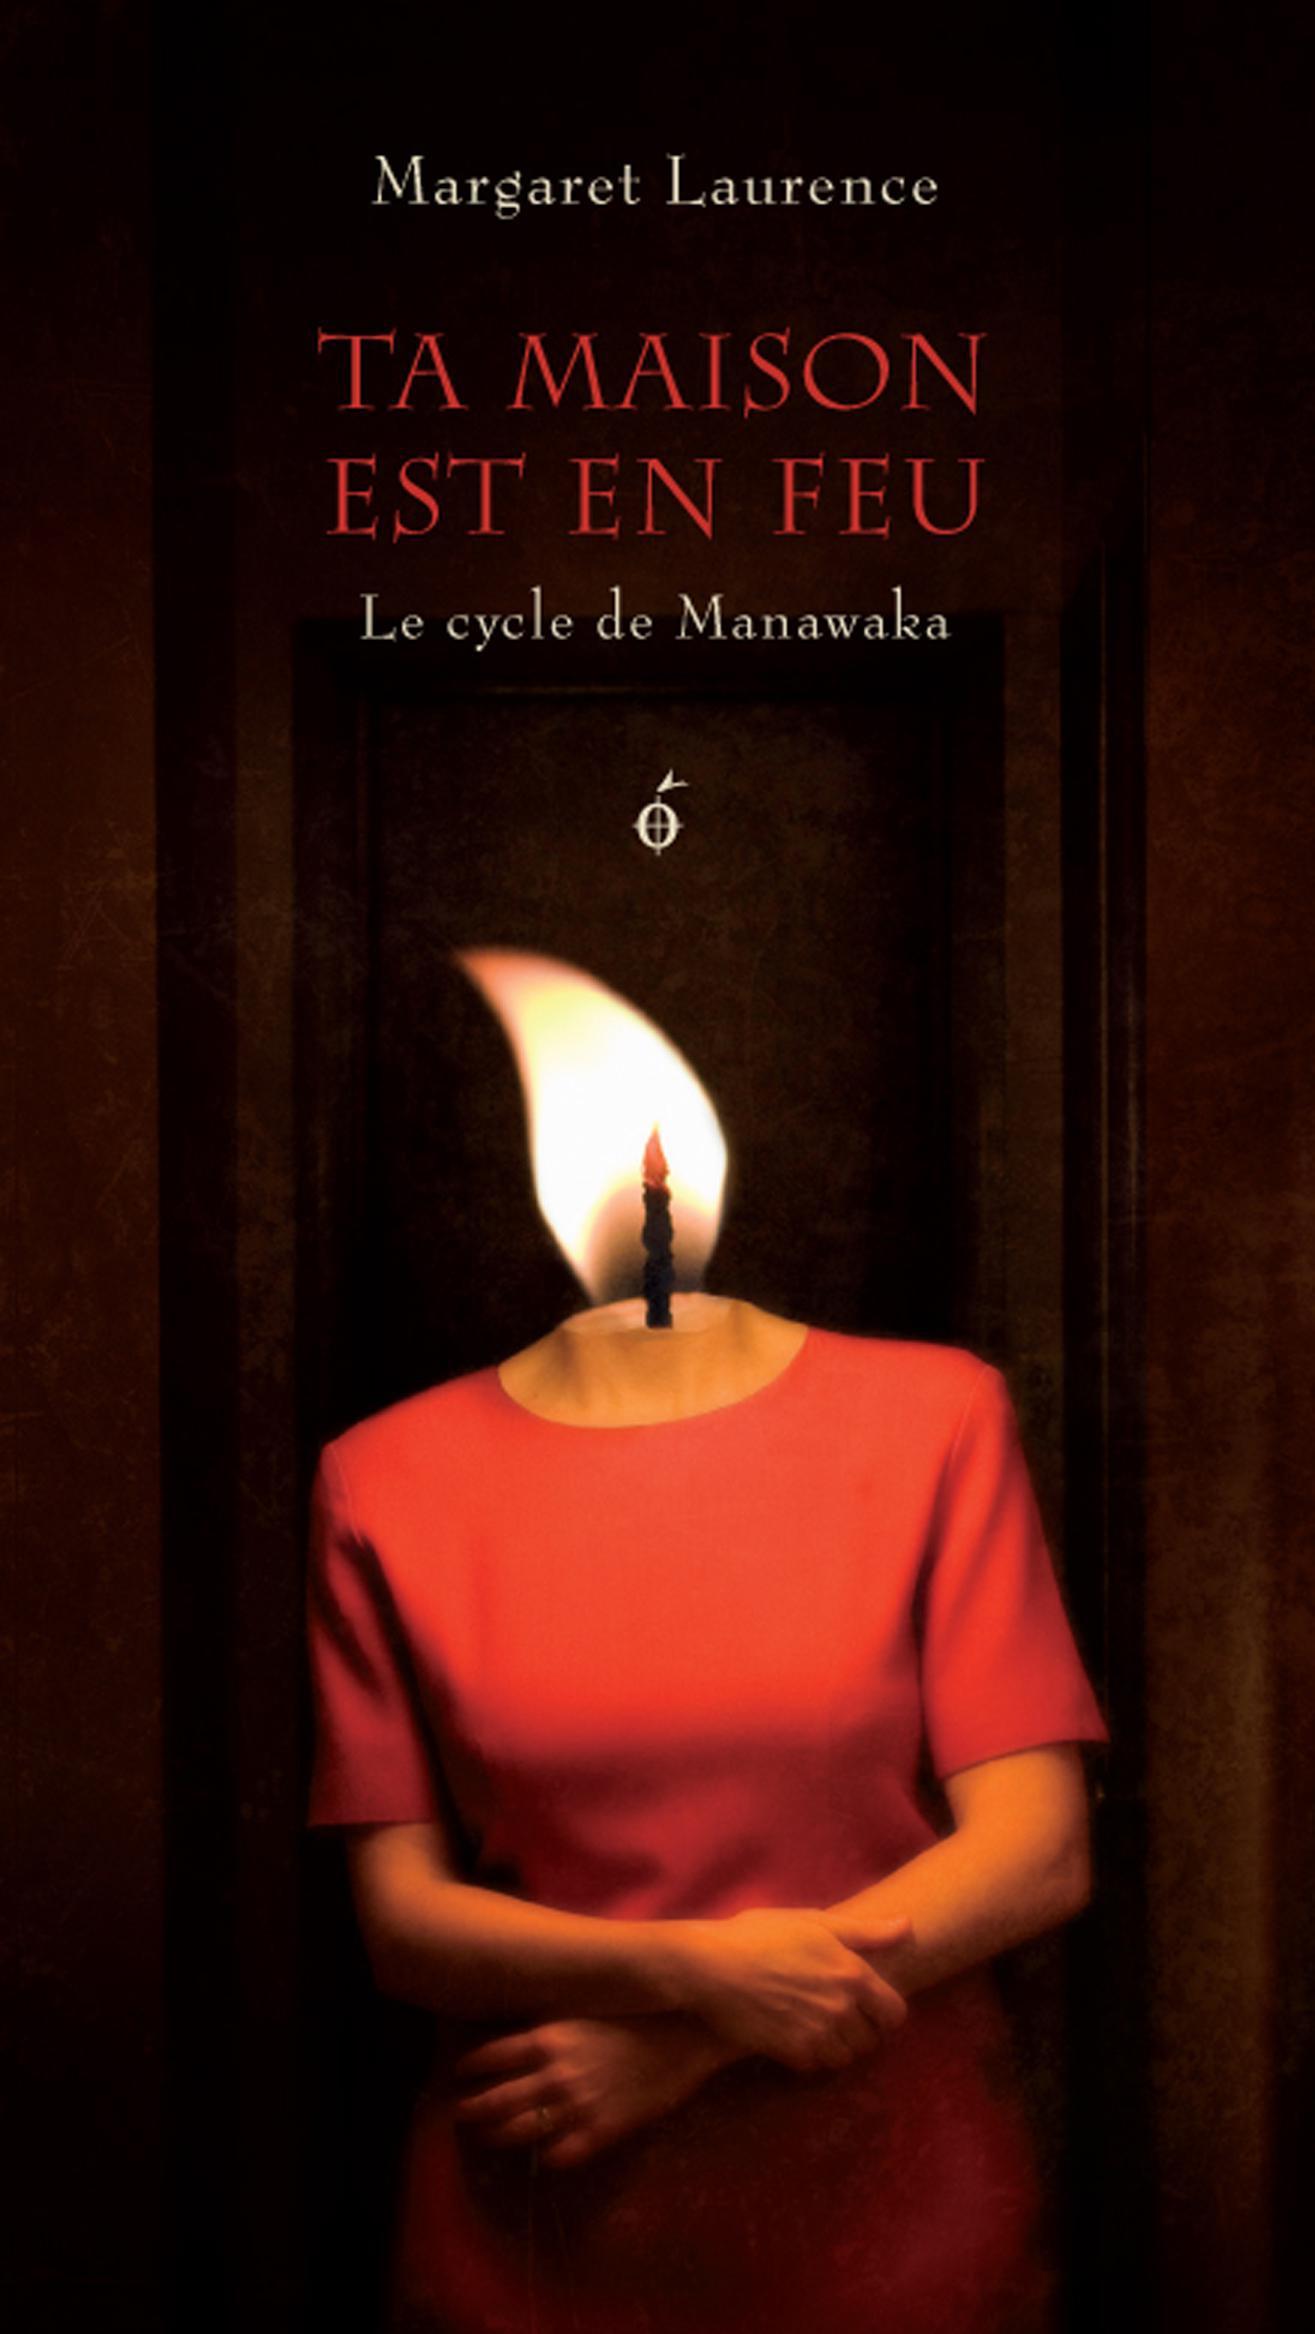 Ta maison est en feu, Le cycle de Manawaka III